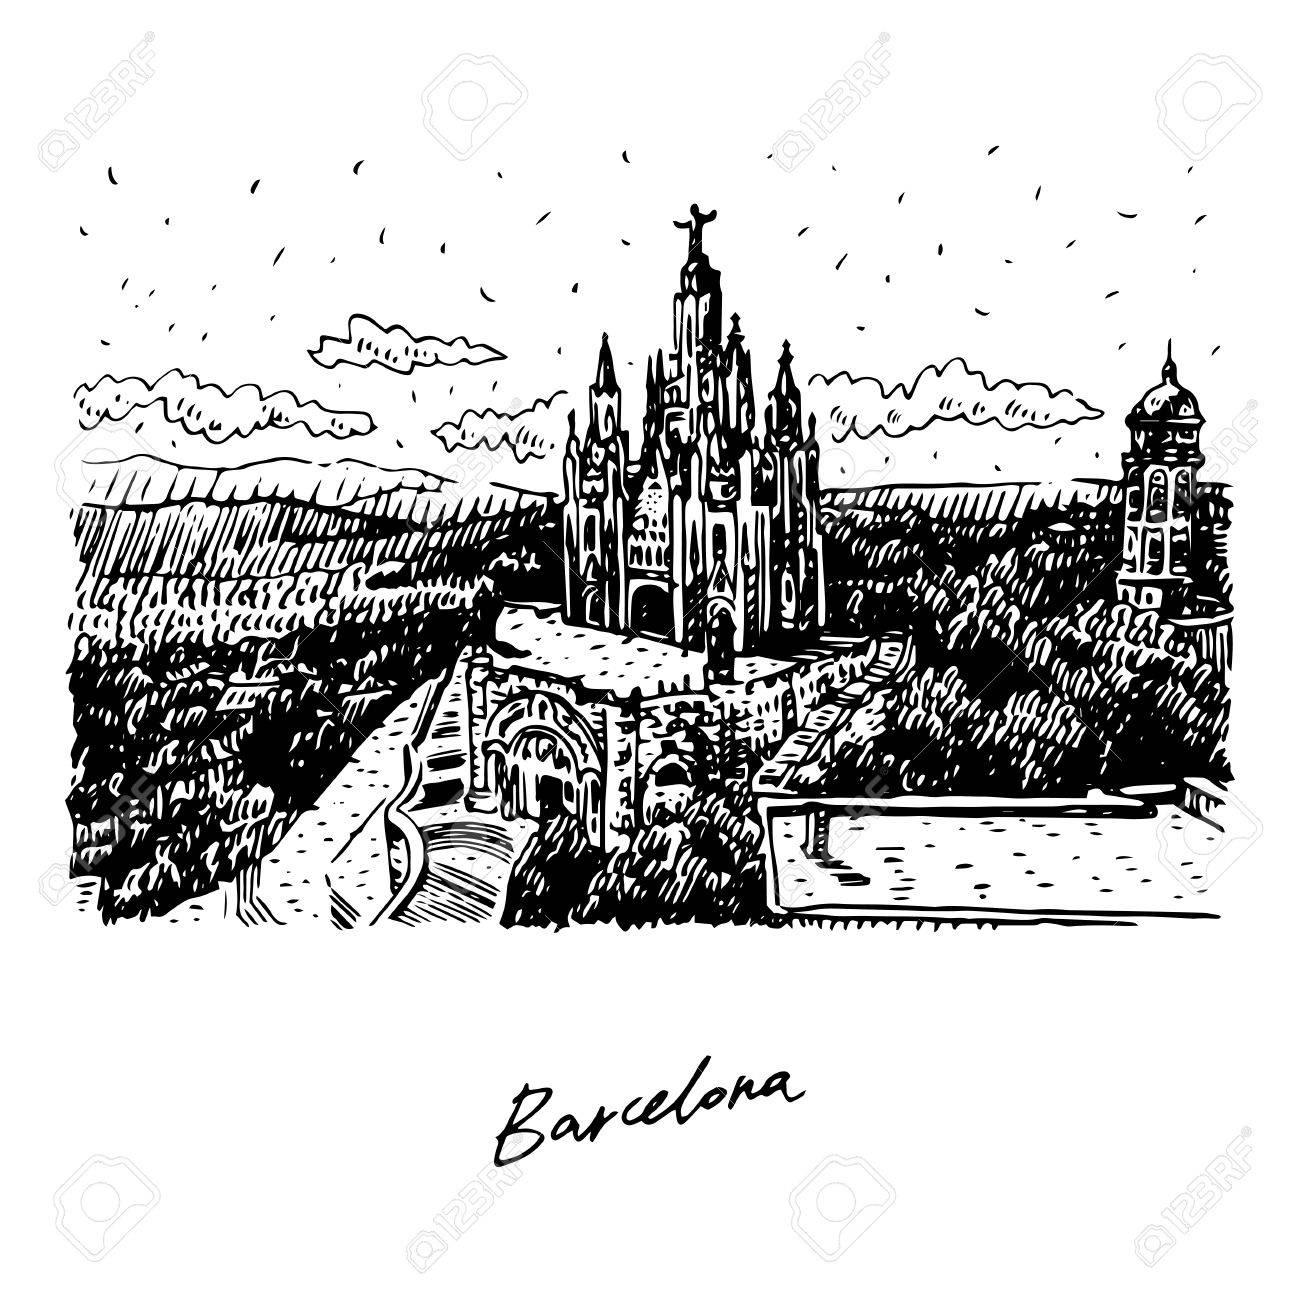 The temple at tibidabo in barcelona catalonia spain drawn